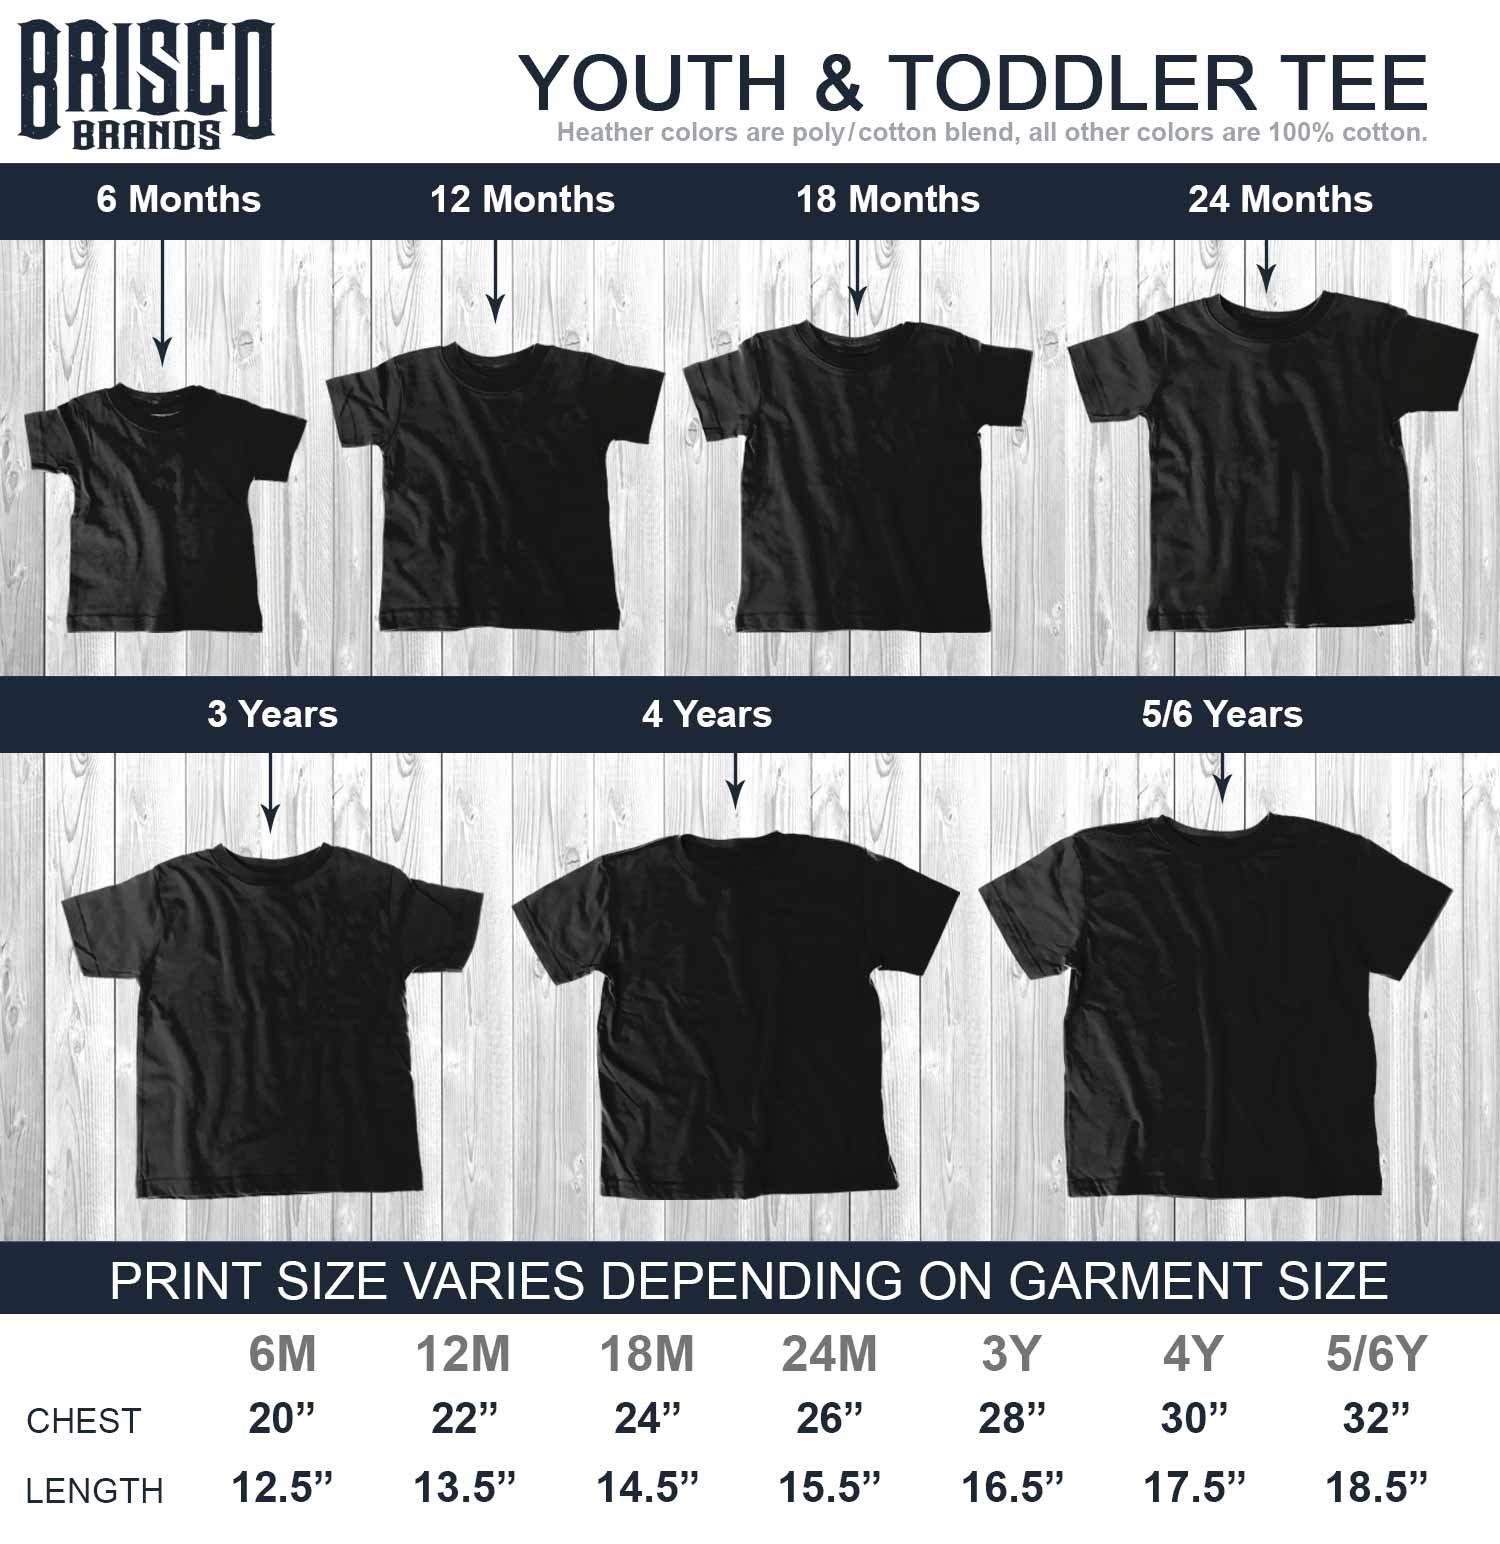 Brisco Brands Star Girl Princess Leia Darth Vader Star Han Solo Wars Yoda Toddler Infant T by Brisco Brands (Image #6)